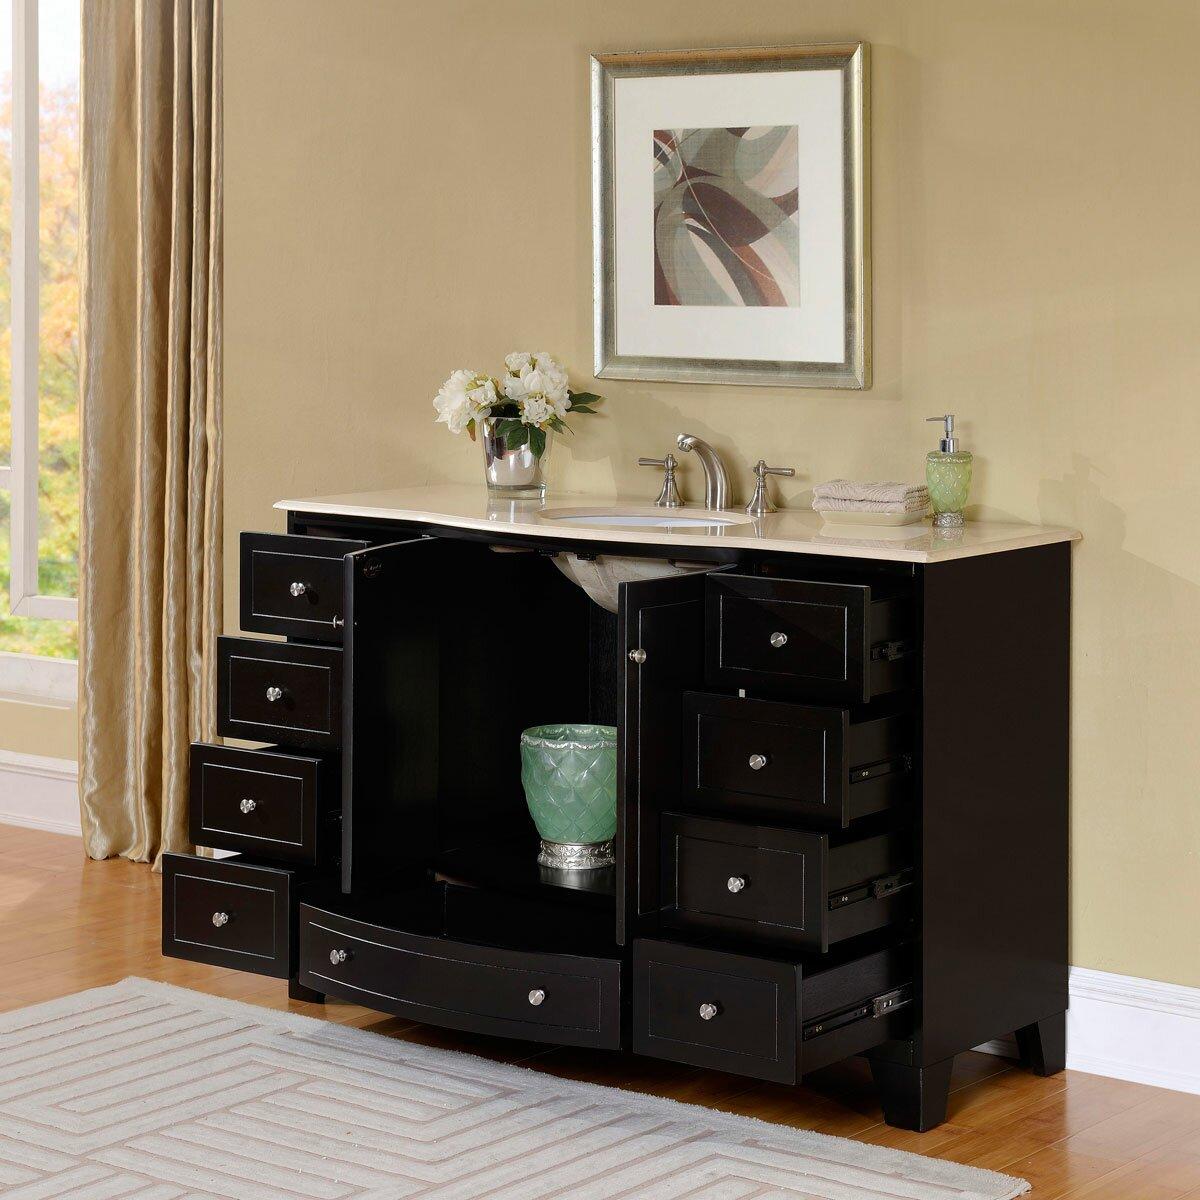 Silkroad exclusive 55 single sink cabinet bathroom vanity for Bathroom vanity and cabinet sets